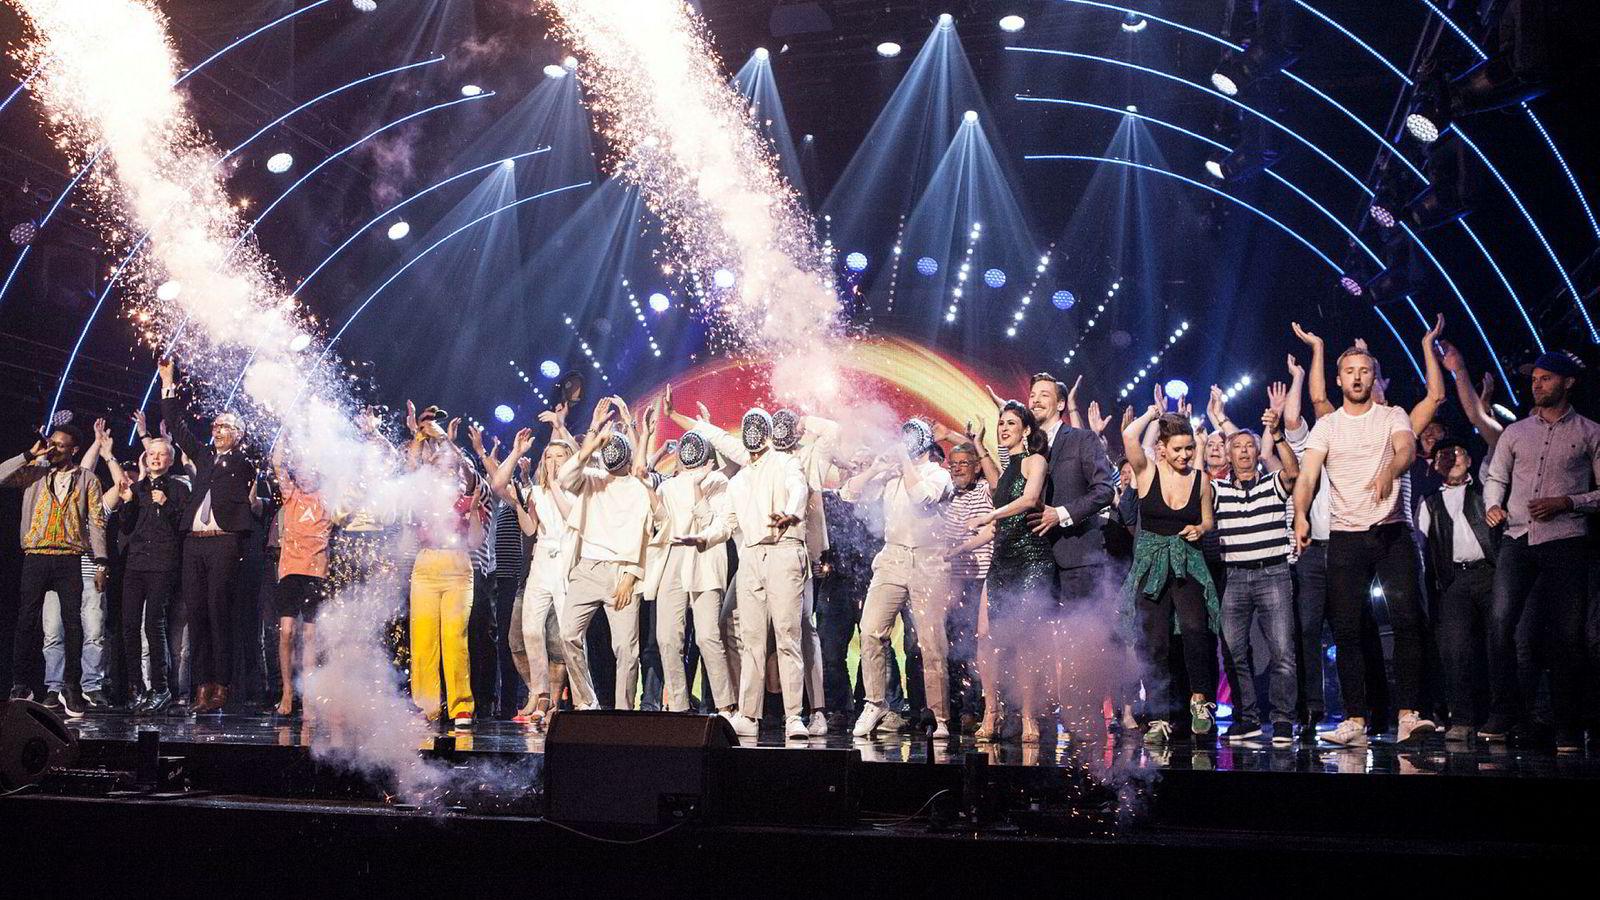 «Norske talenter» har gått på tv siden 2008, med pauser i 2013 og 2016. Til høsten kommer den tiende sesongen på TV 2.